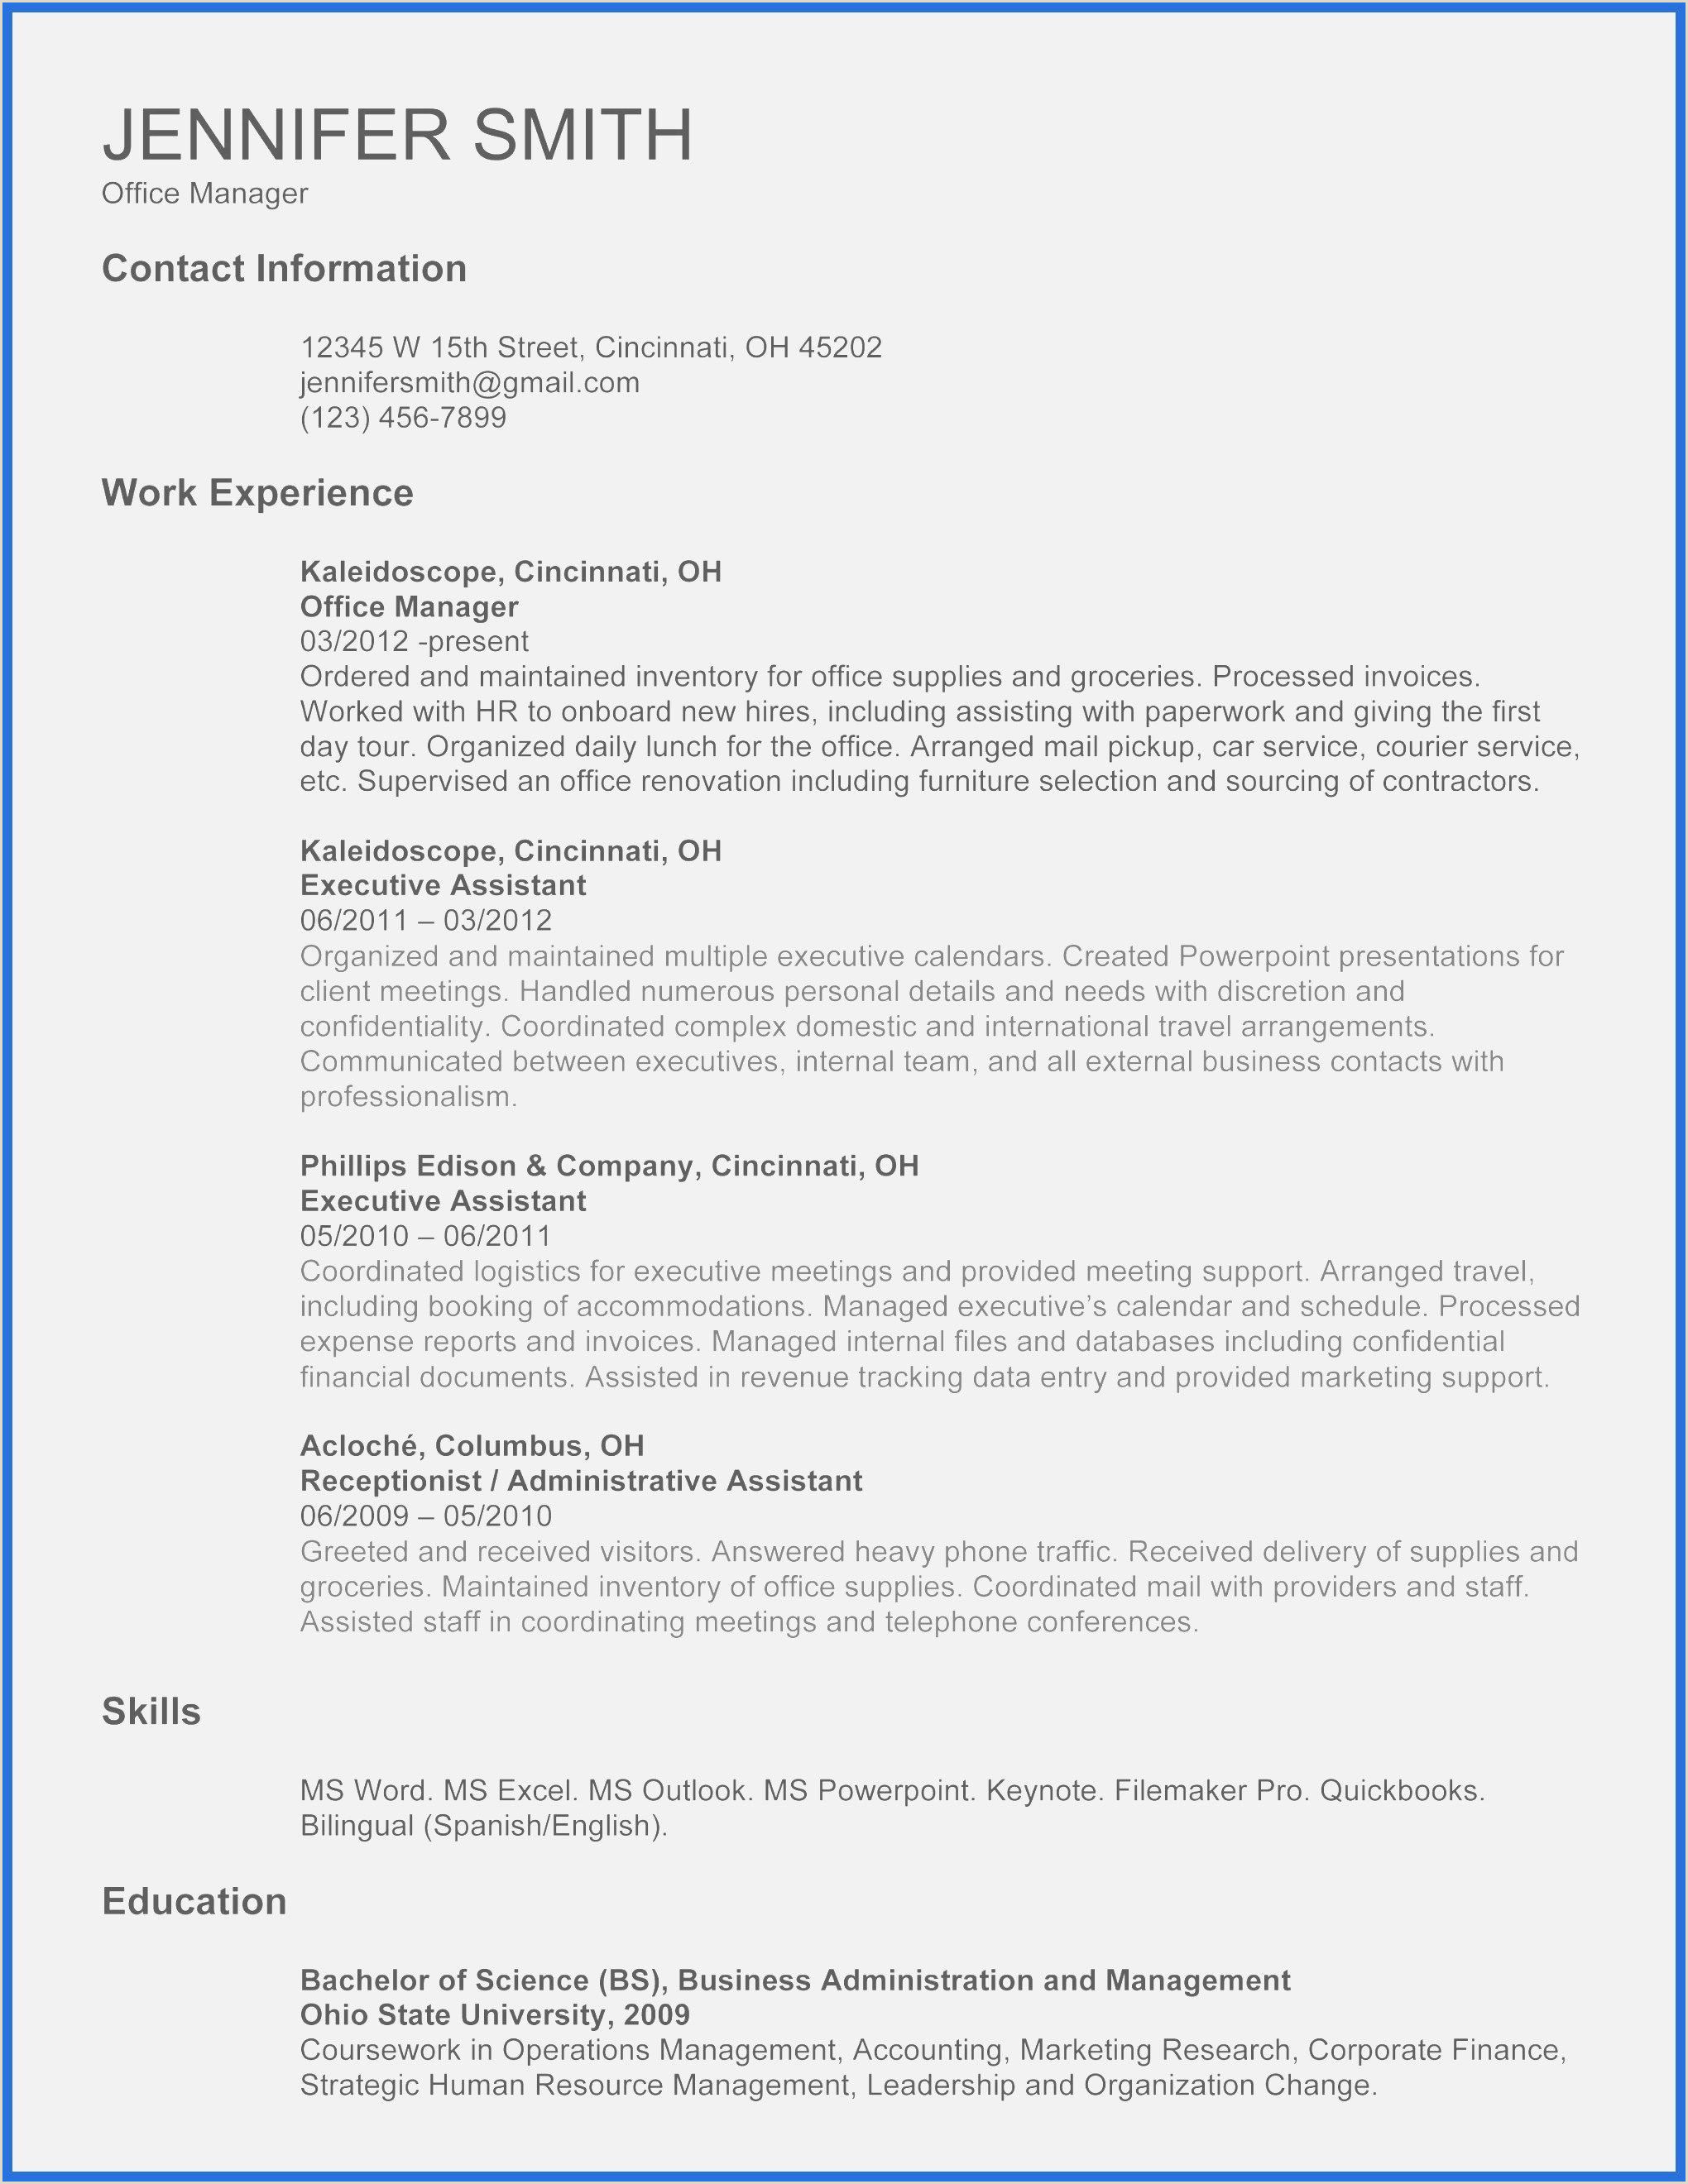 Teaching Professional Cv format Template for Resume Microsoft Word – Salumguilher